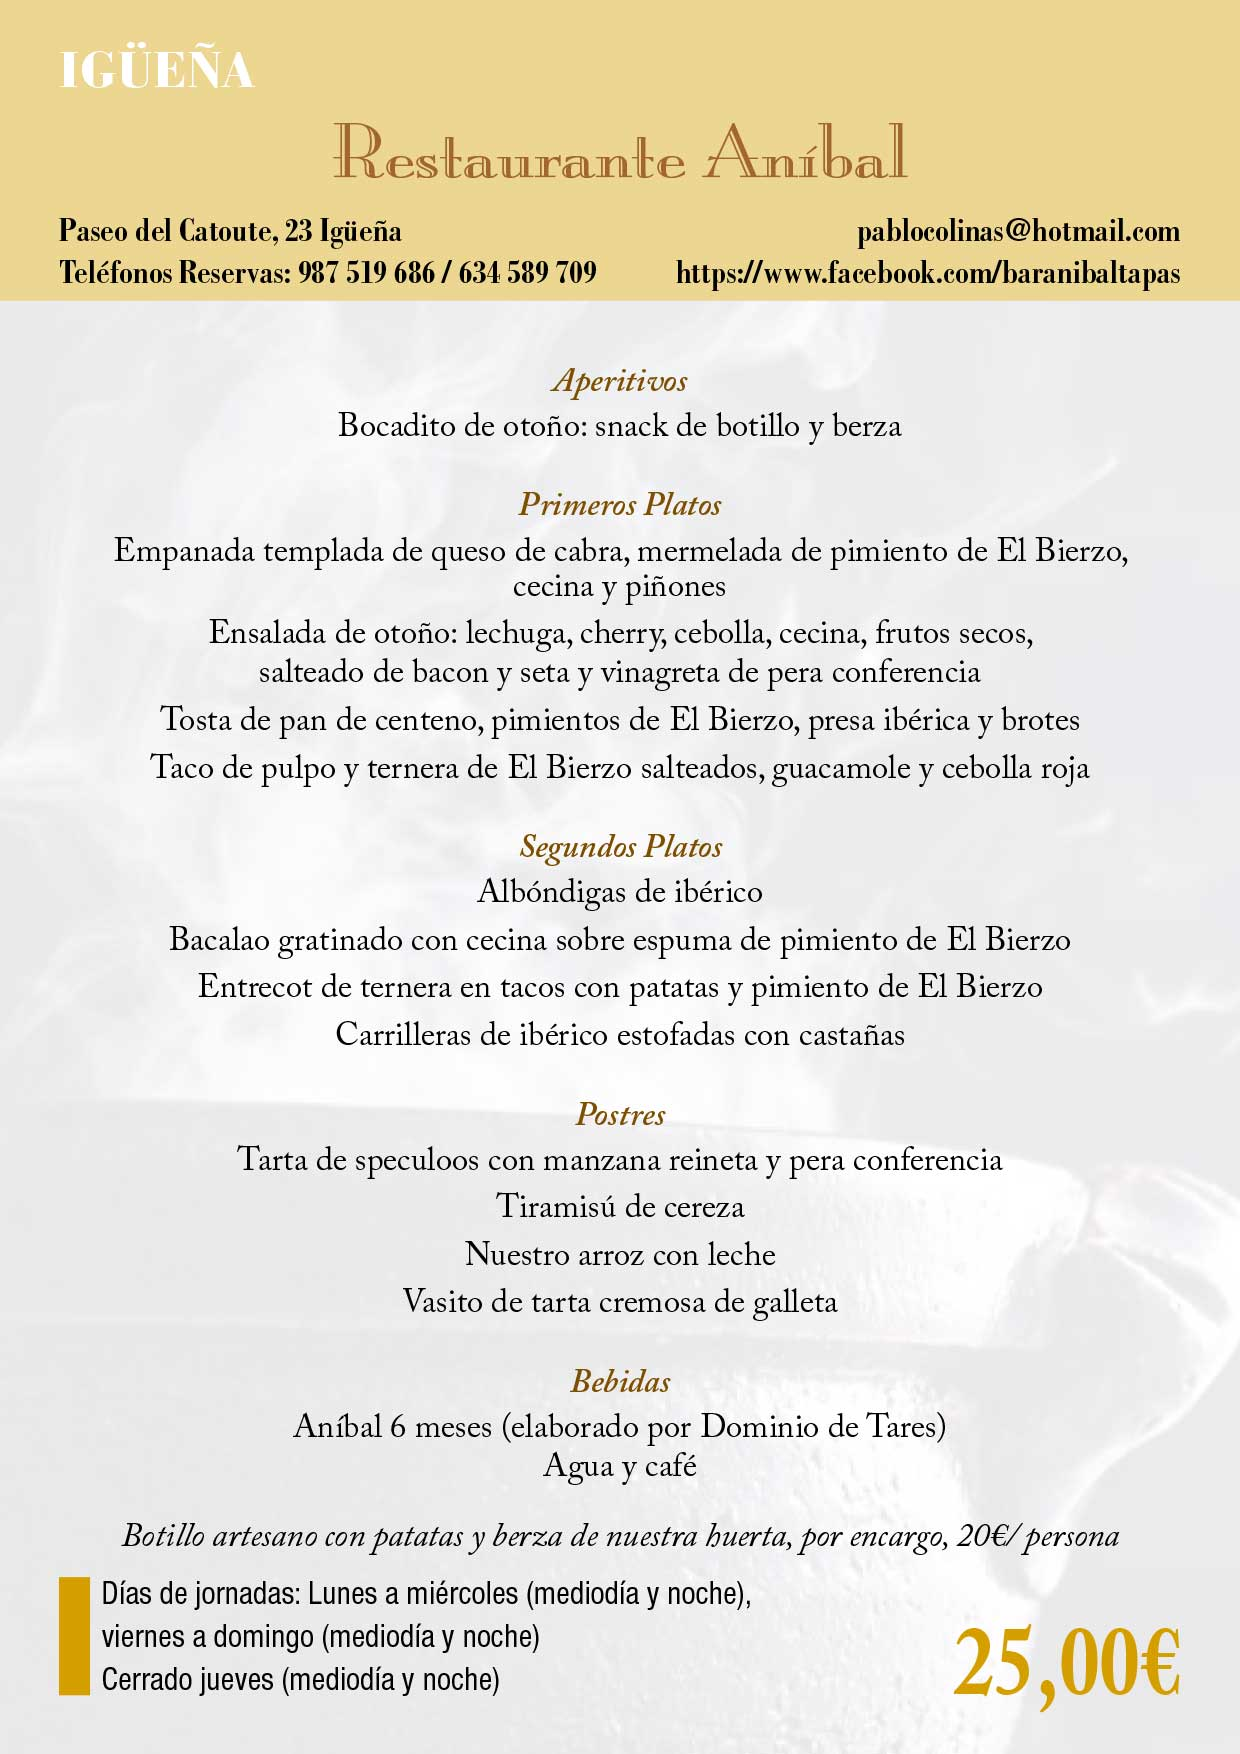 XXXIII Jornadas gastronómicas del Bierzo 2017. Restaurantes participantes 9